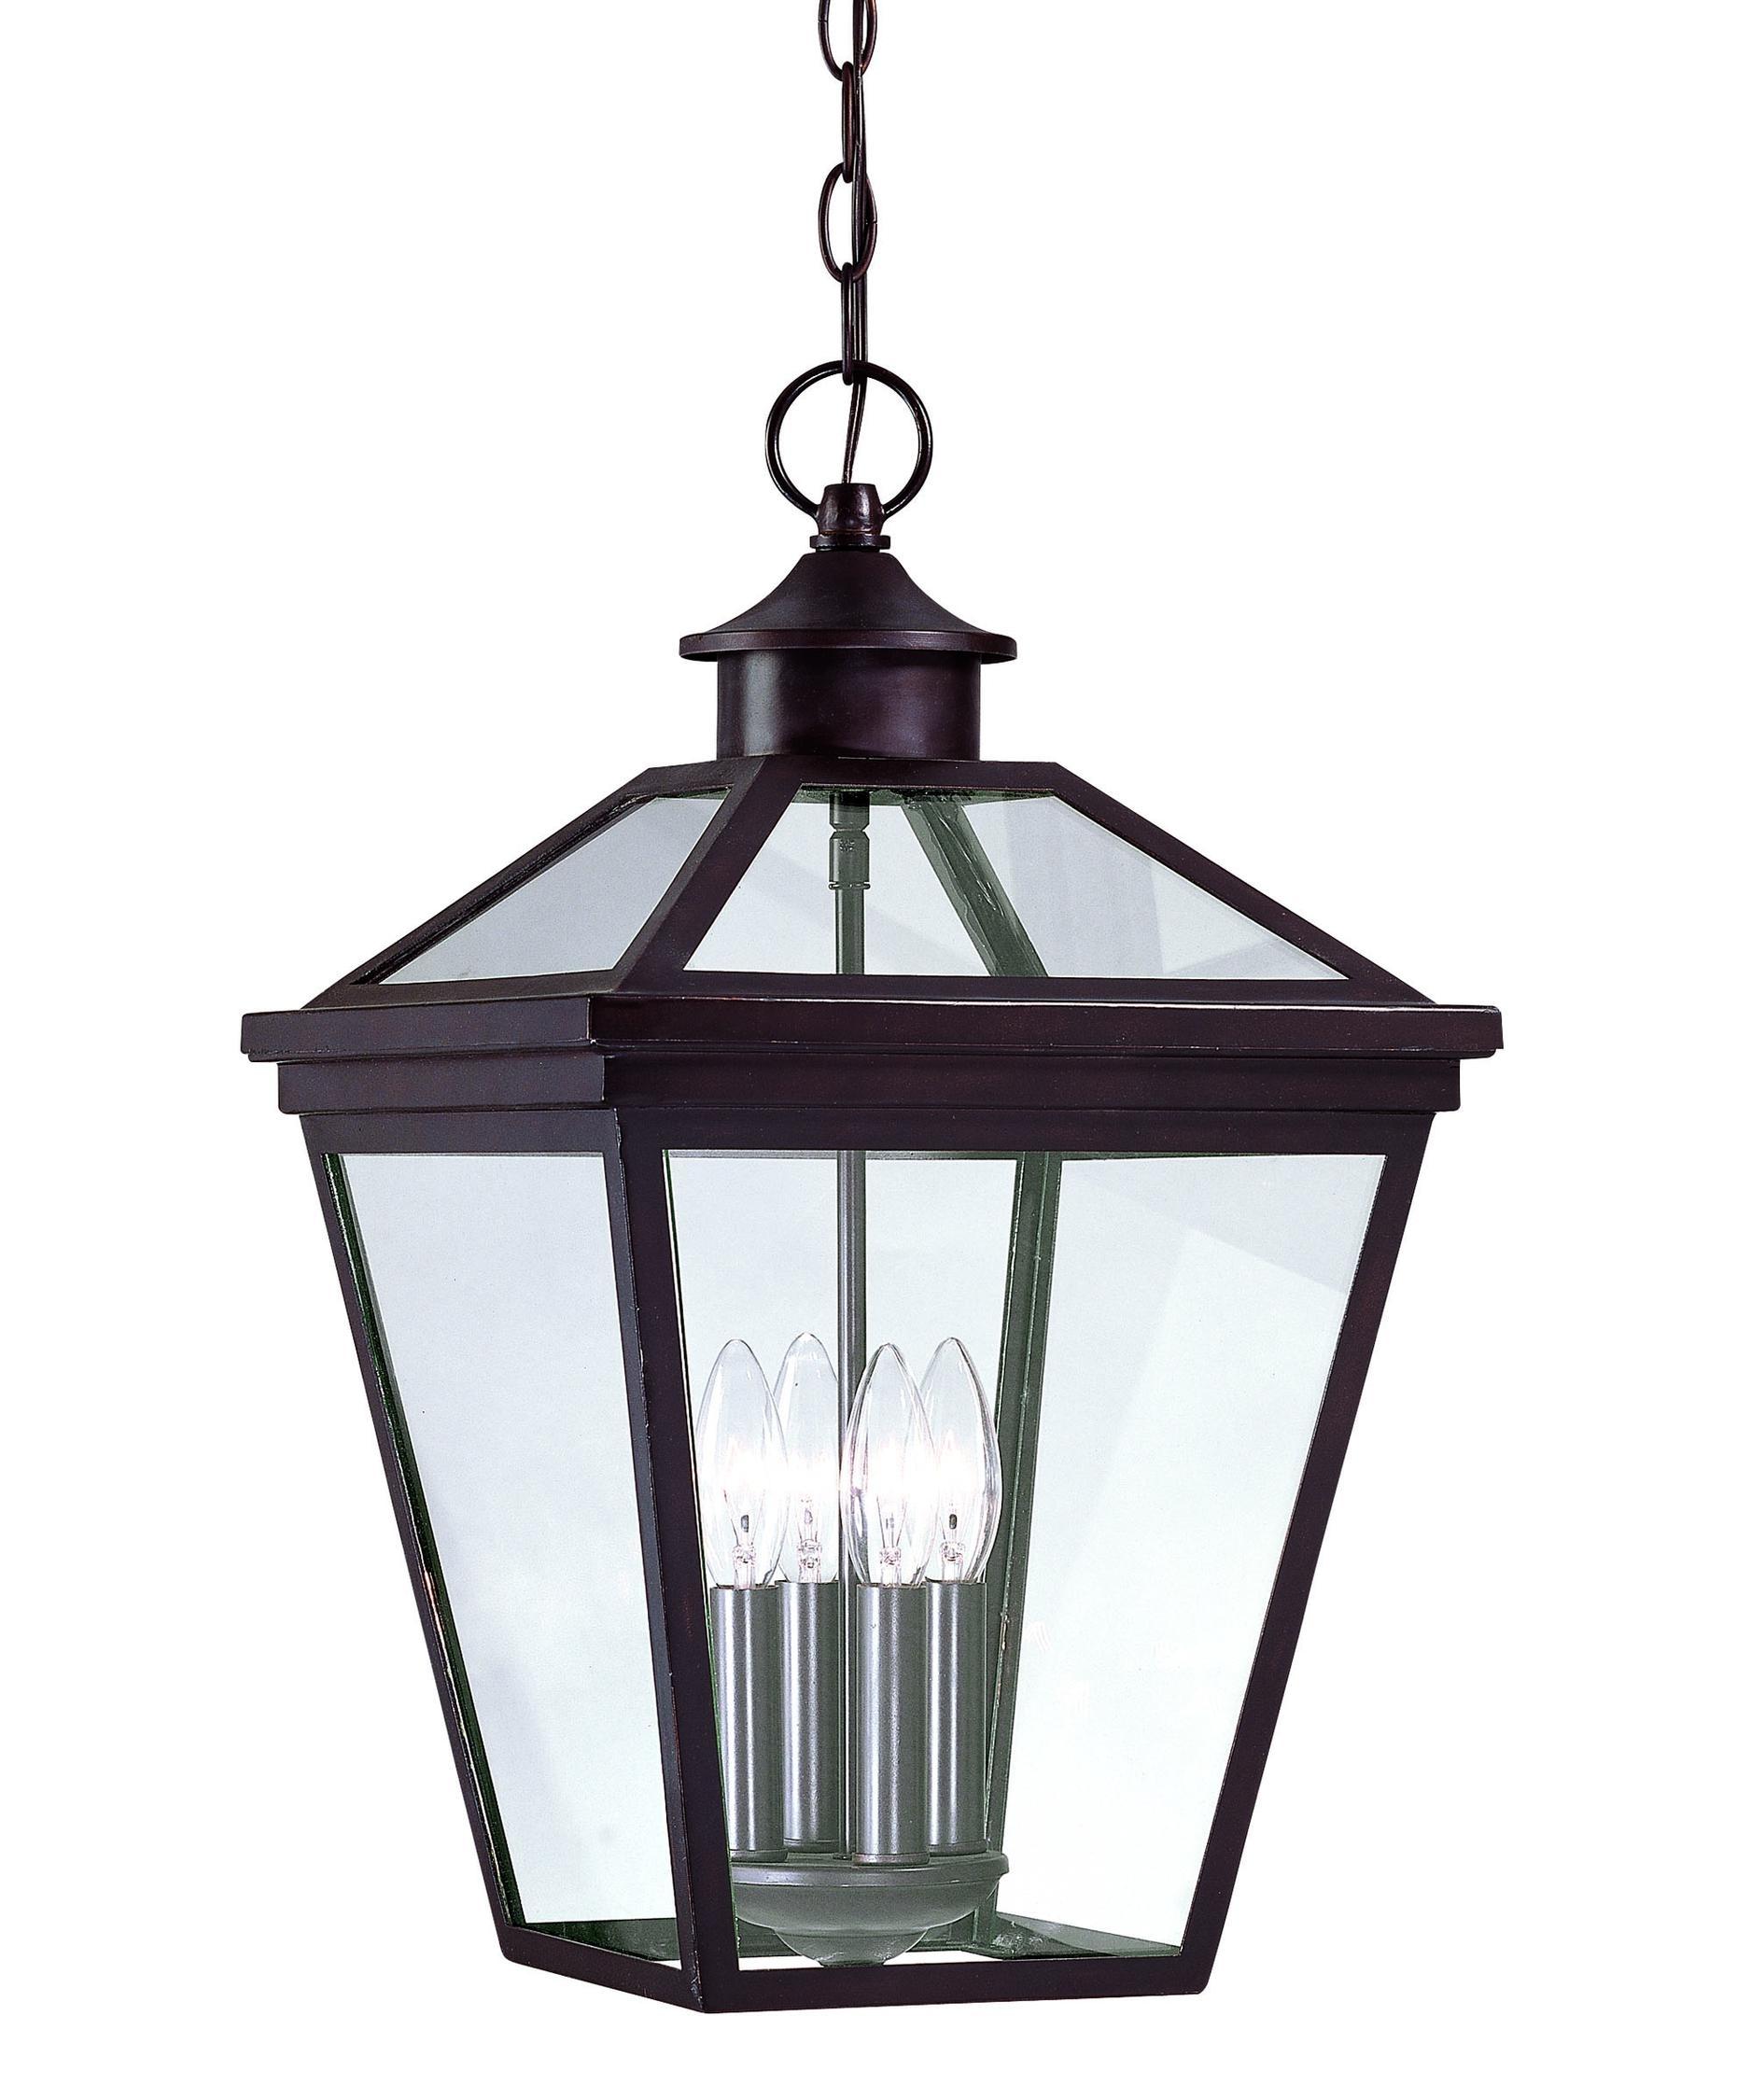 Wide Outdoor Hanging Light With 4 Lamps | Beautiful Chandeliers Regarding Outdoor Rated Hanging Lights (#15 of 15)